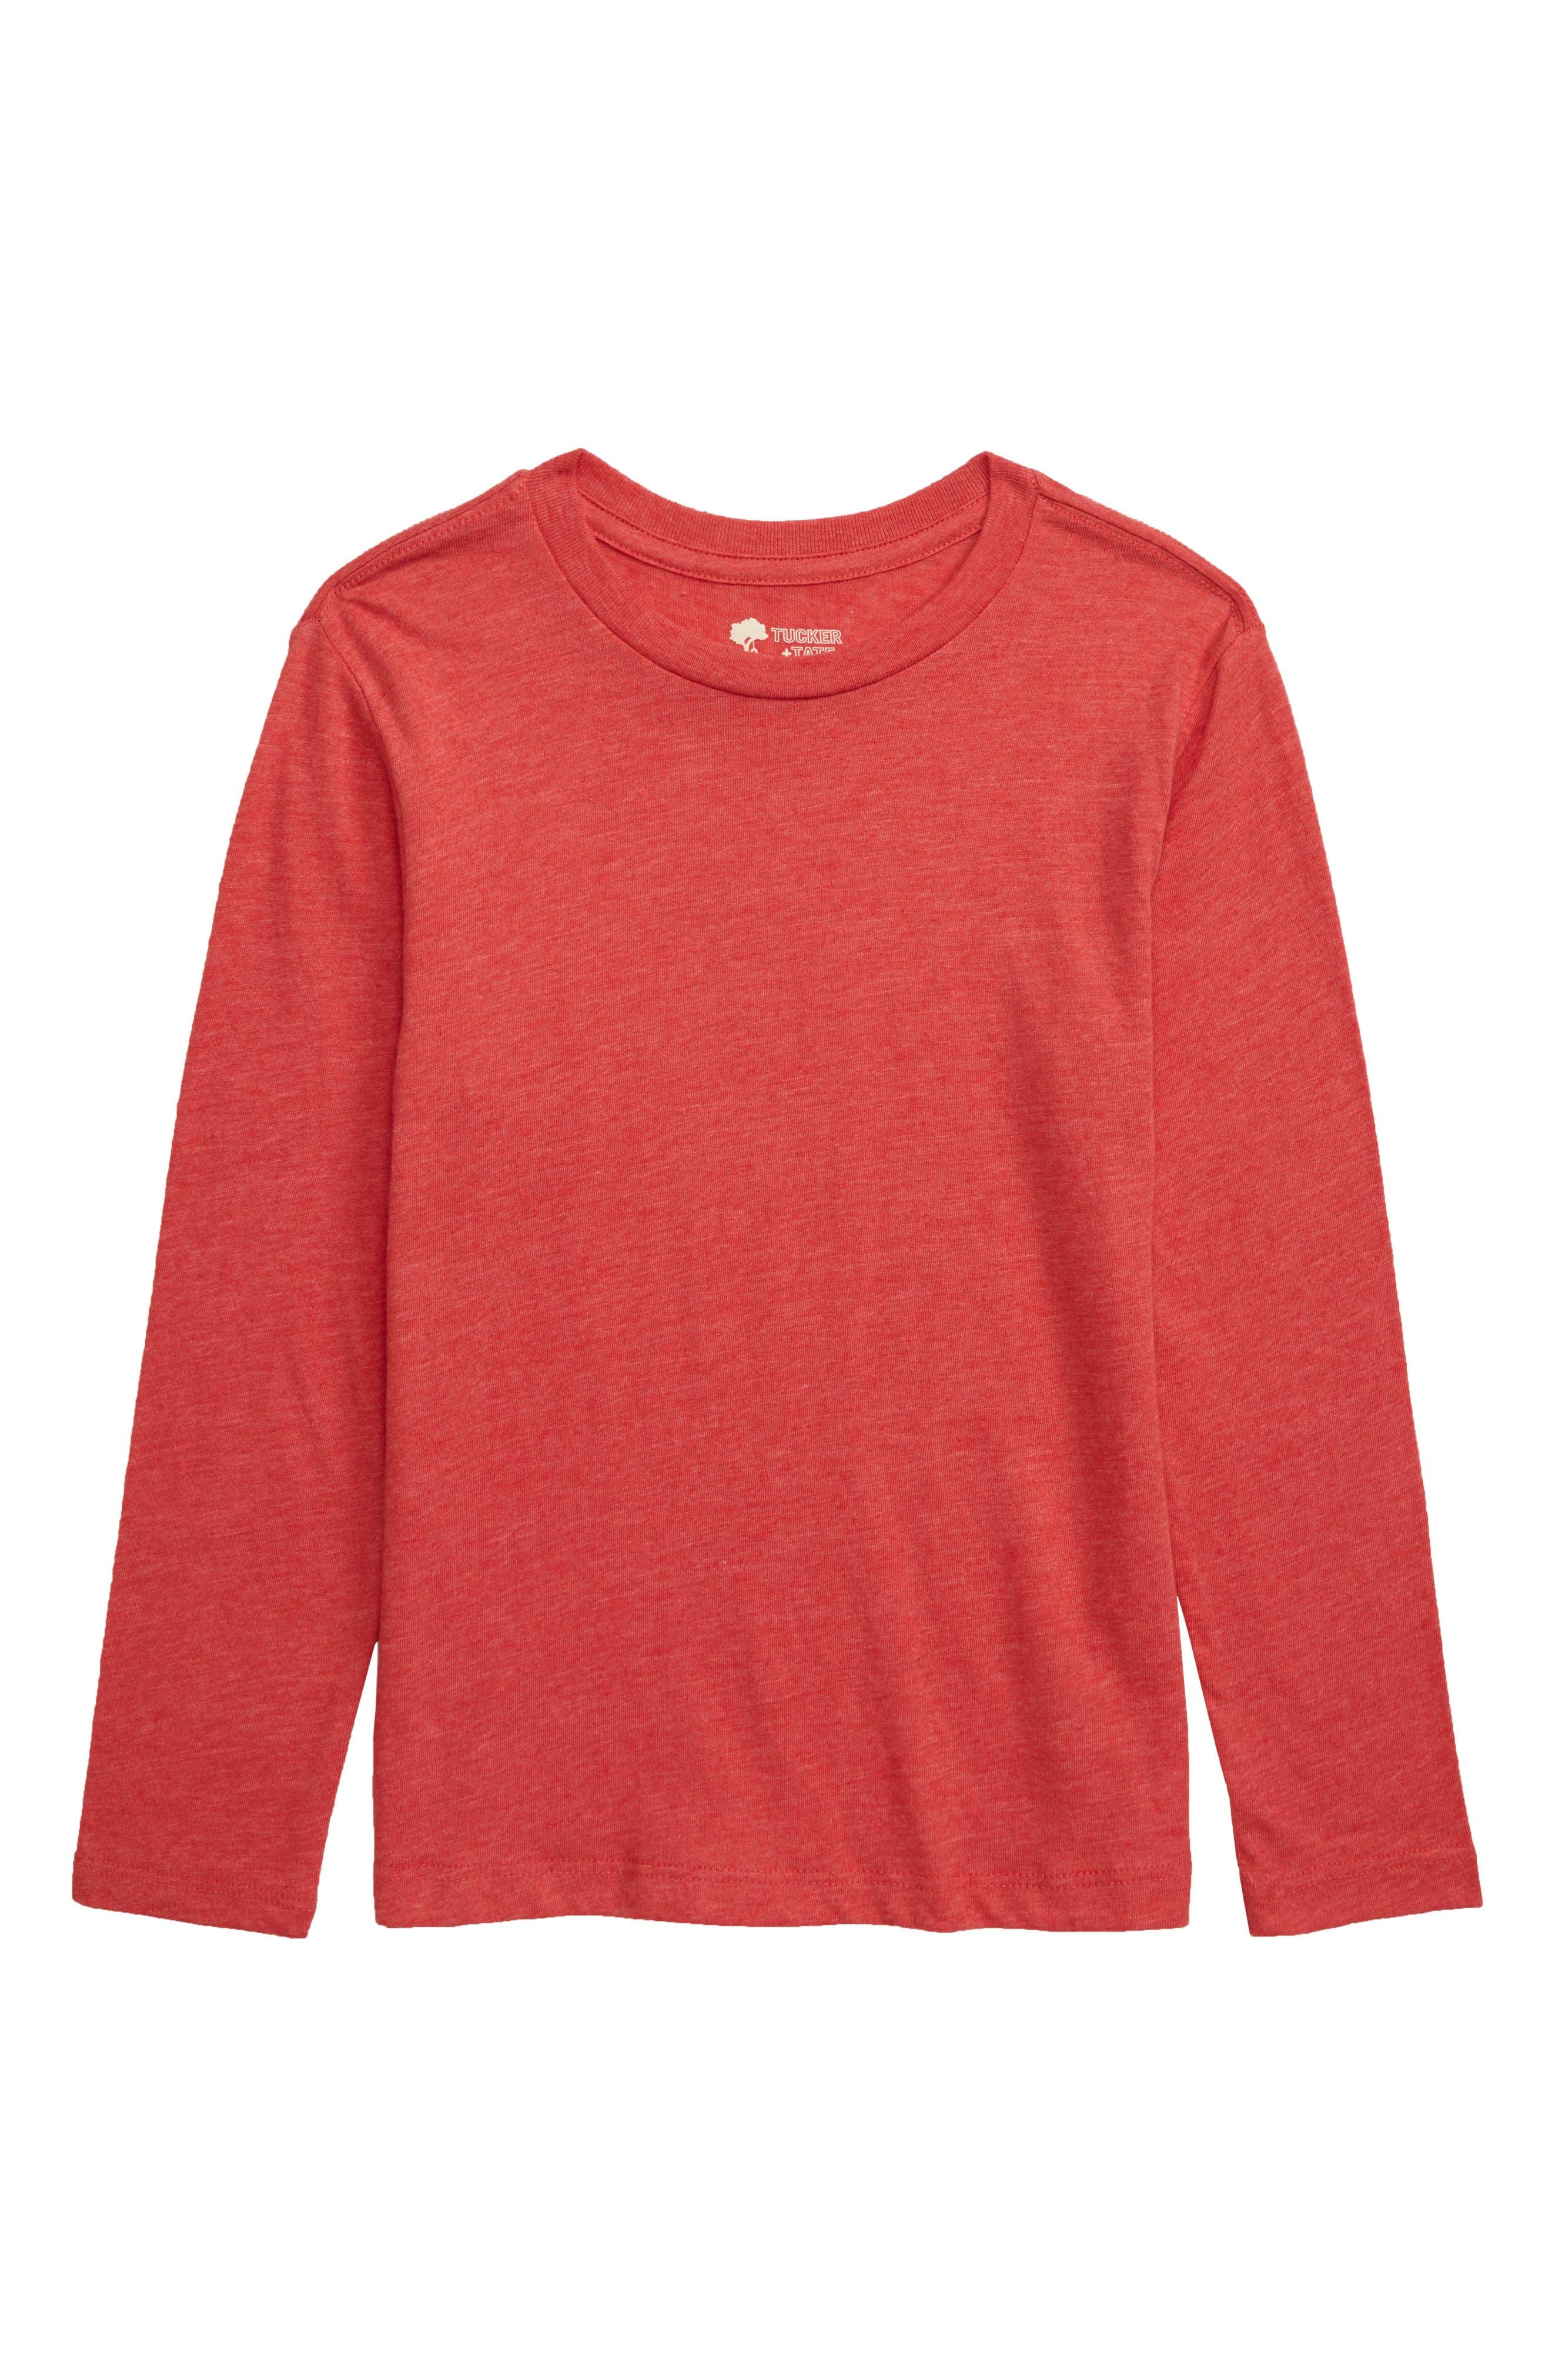 Boys Tucker  Tate Long Sleeve TShirt Size 7  Red